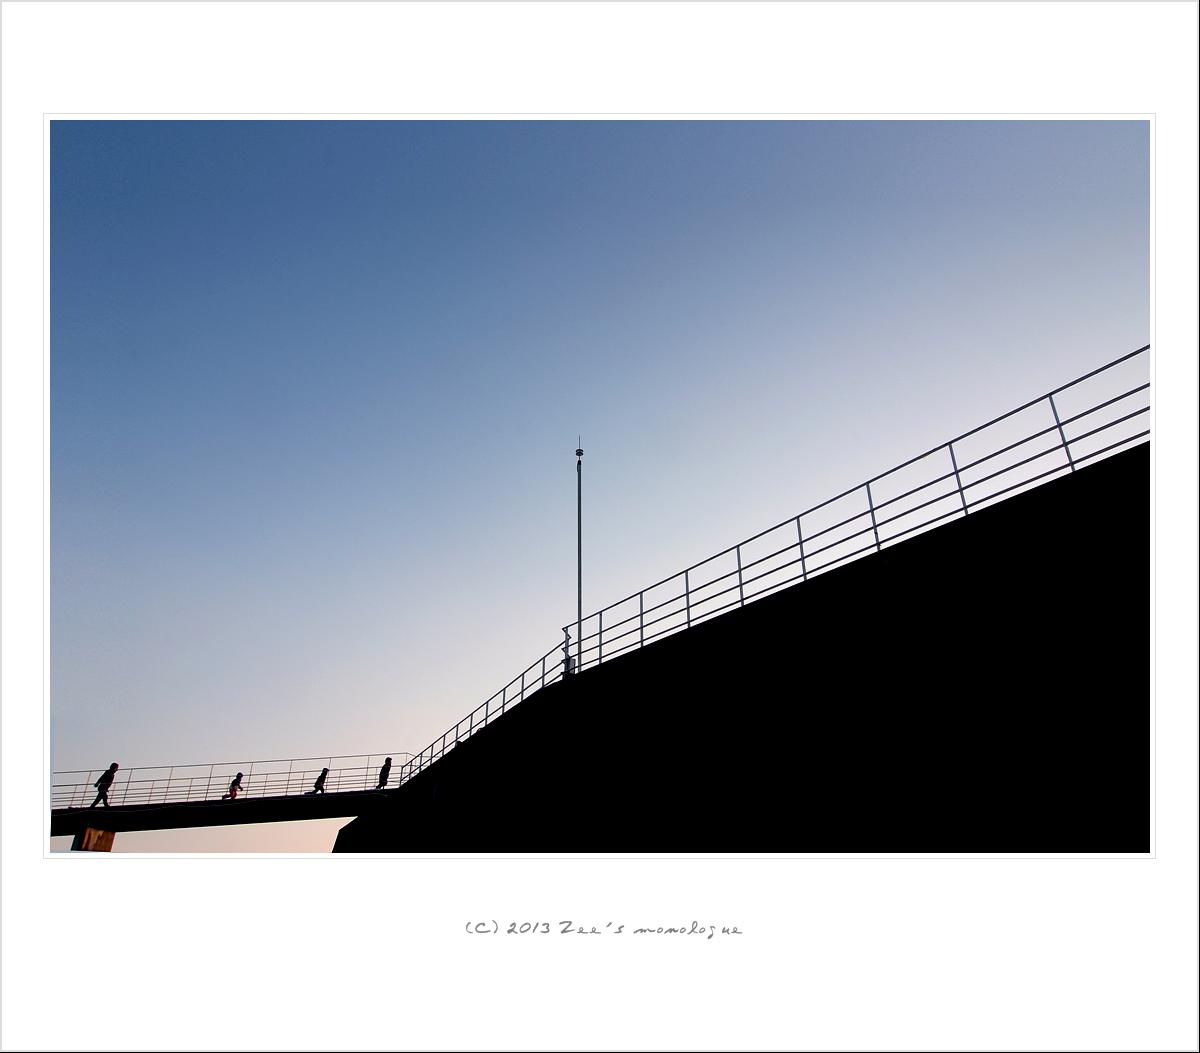 work-DSCF3781-r.jpg